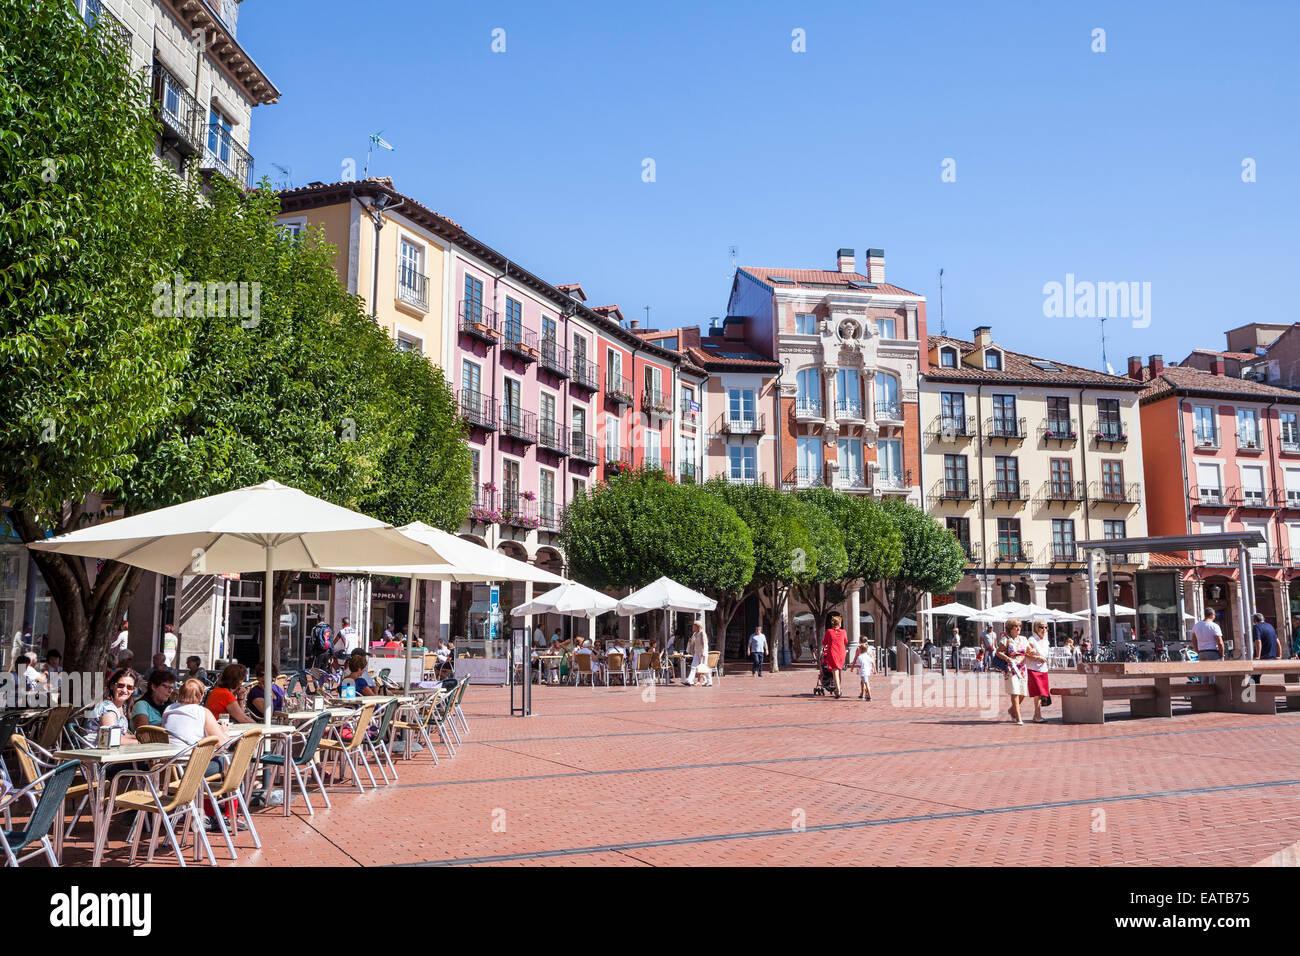 Plaza Mayor in Burgos city, Way of St. James, Burgos, Spain - Stock Image